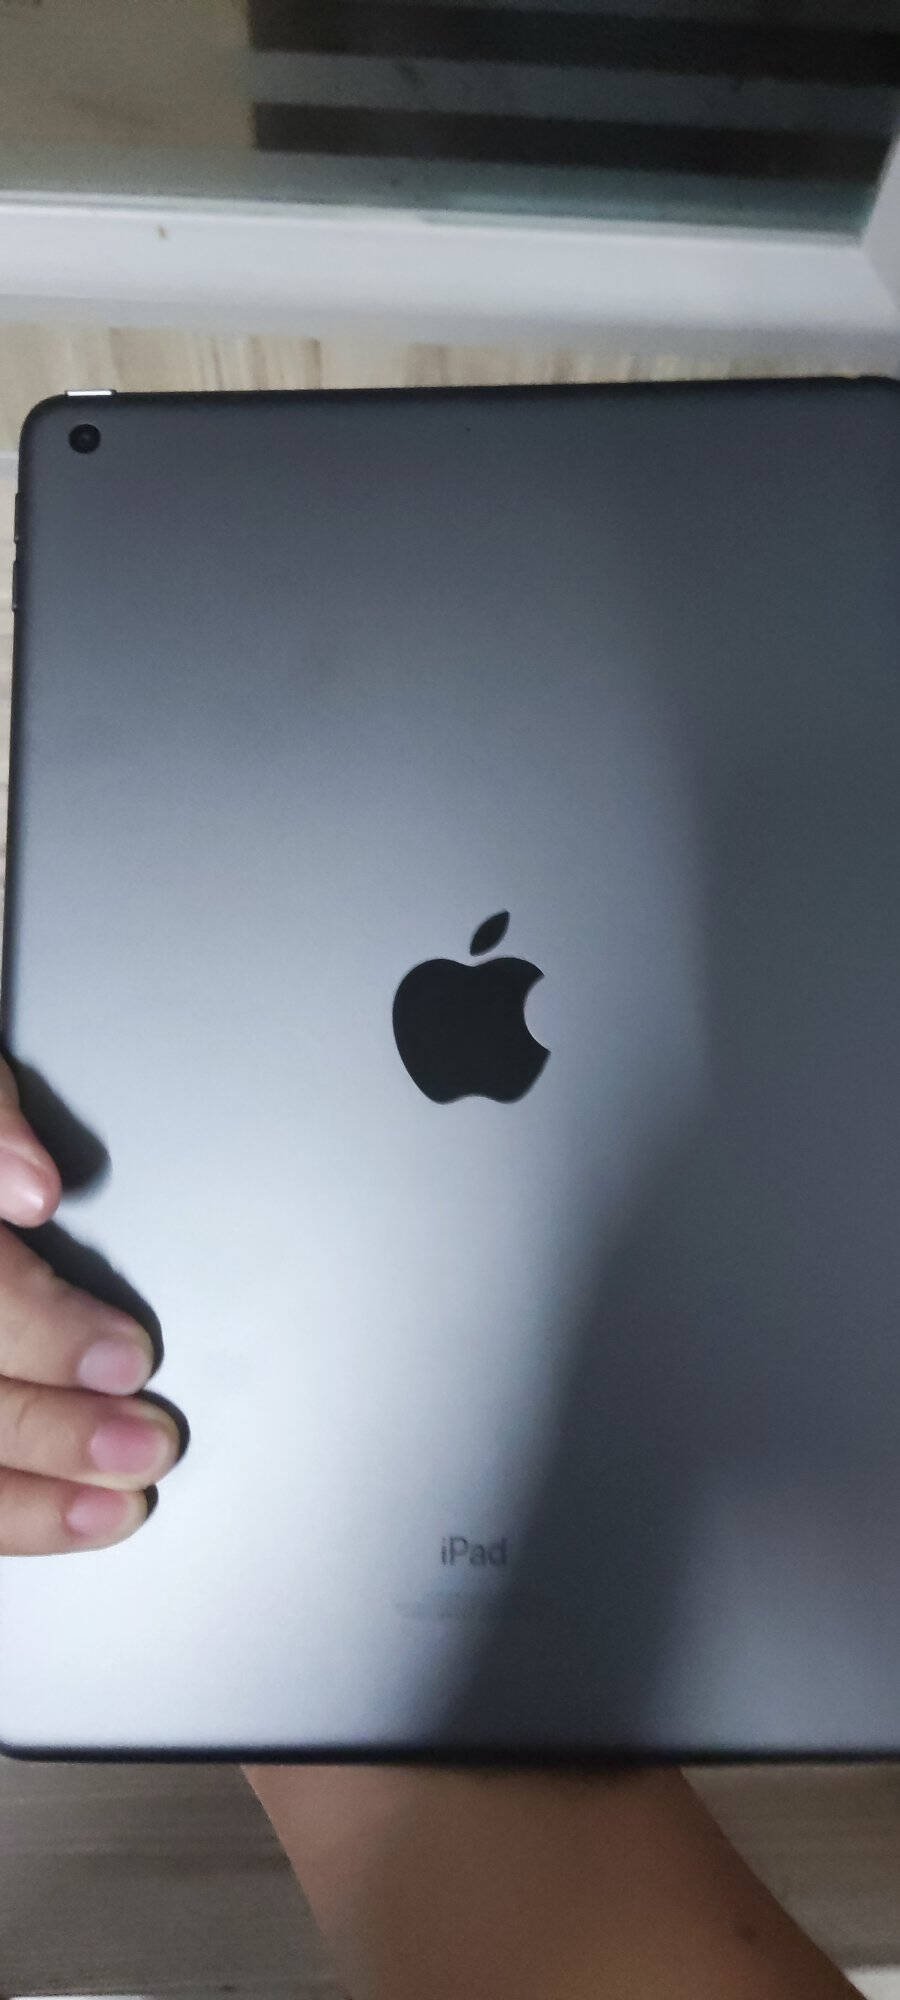 AppleiPad10.2英寸平板电脑2021年新款(256GBWLAN版/A13芯片/1200万像素/iPadOSMK2N3CH/A)深空灰色